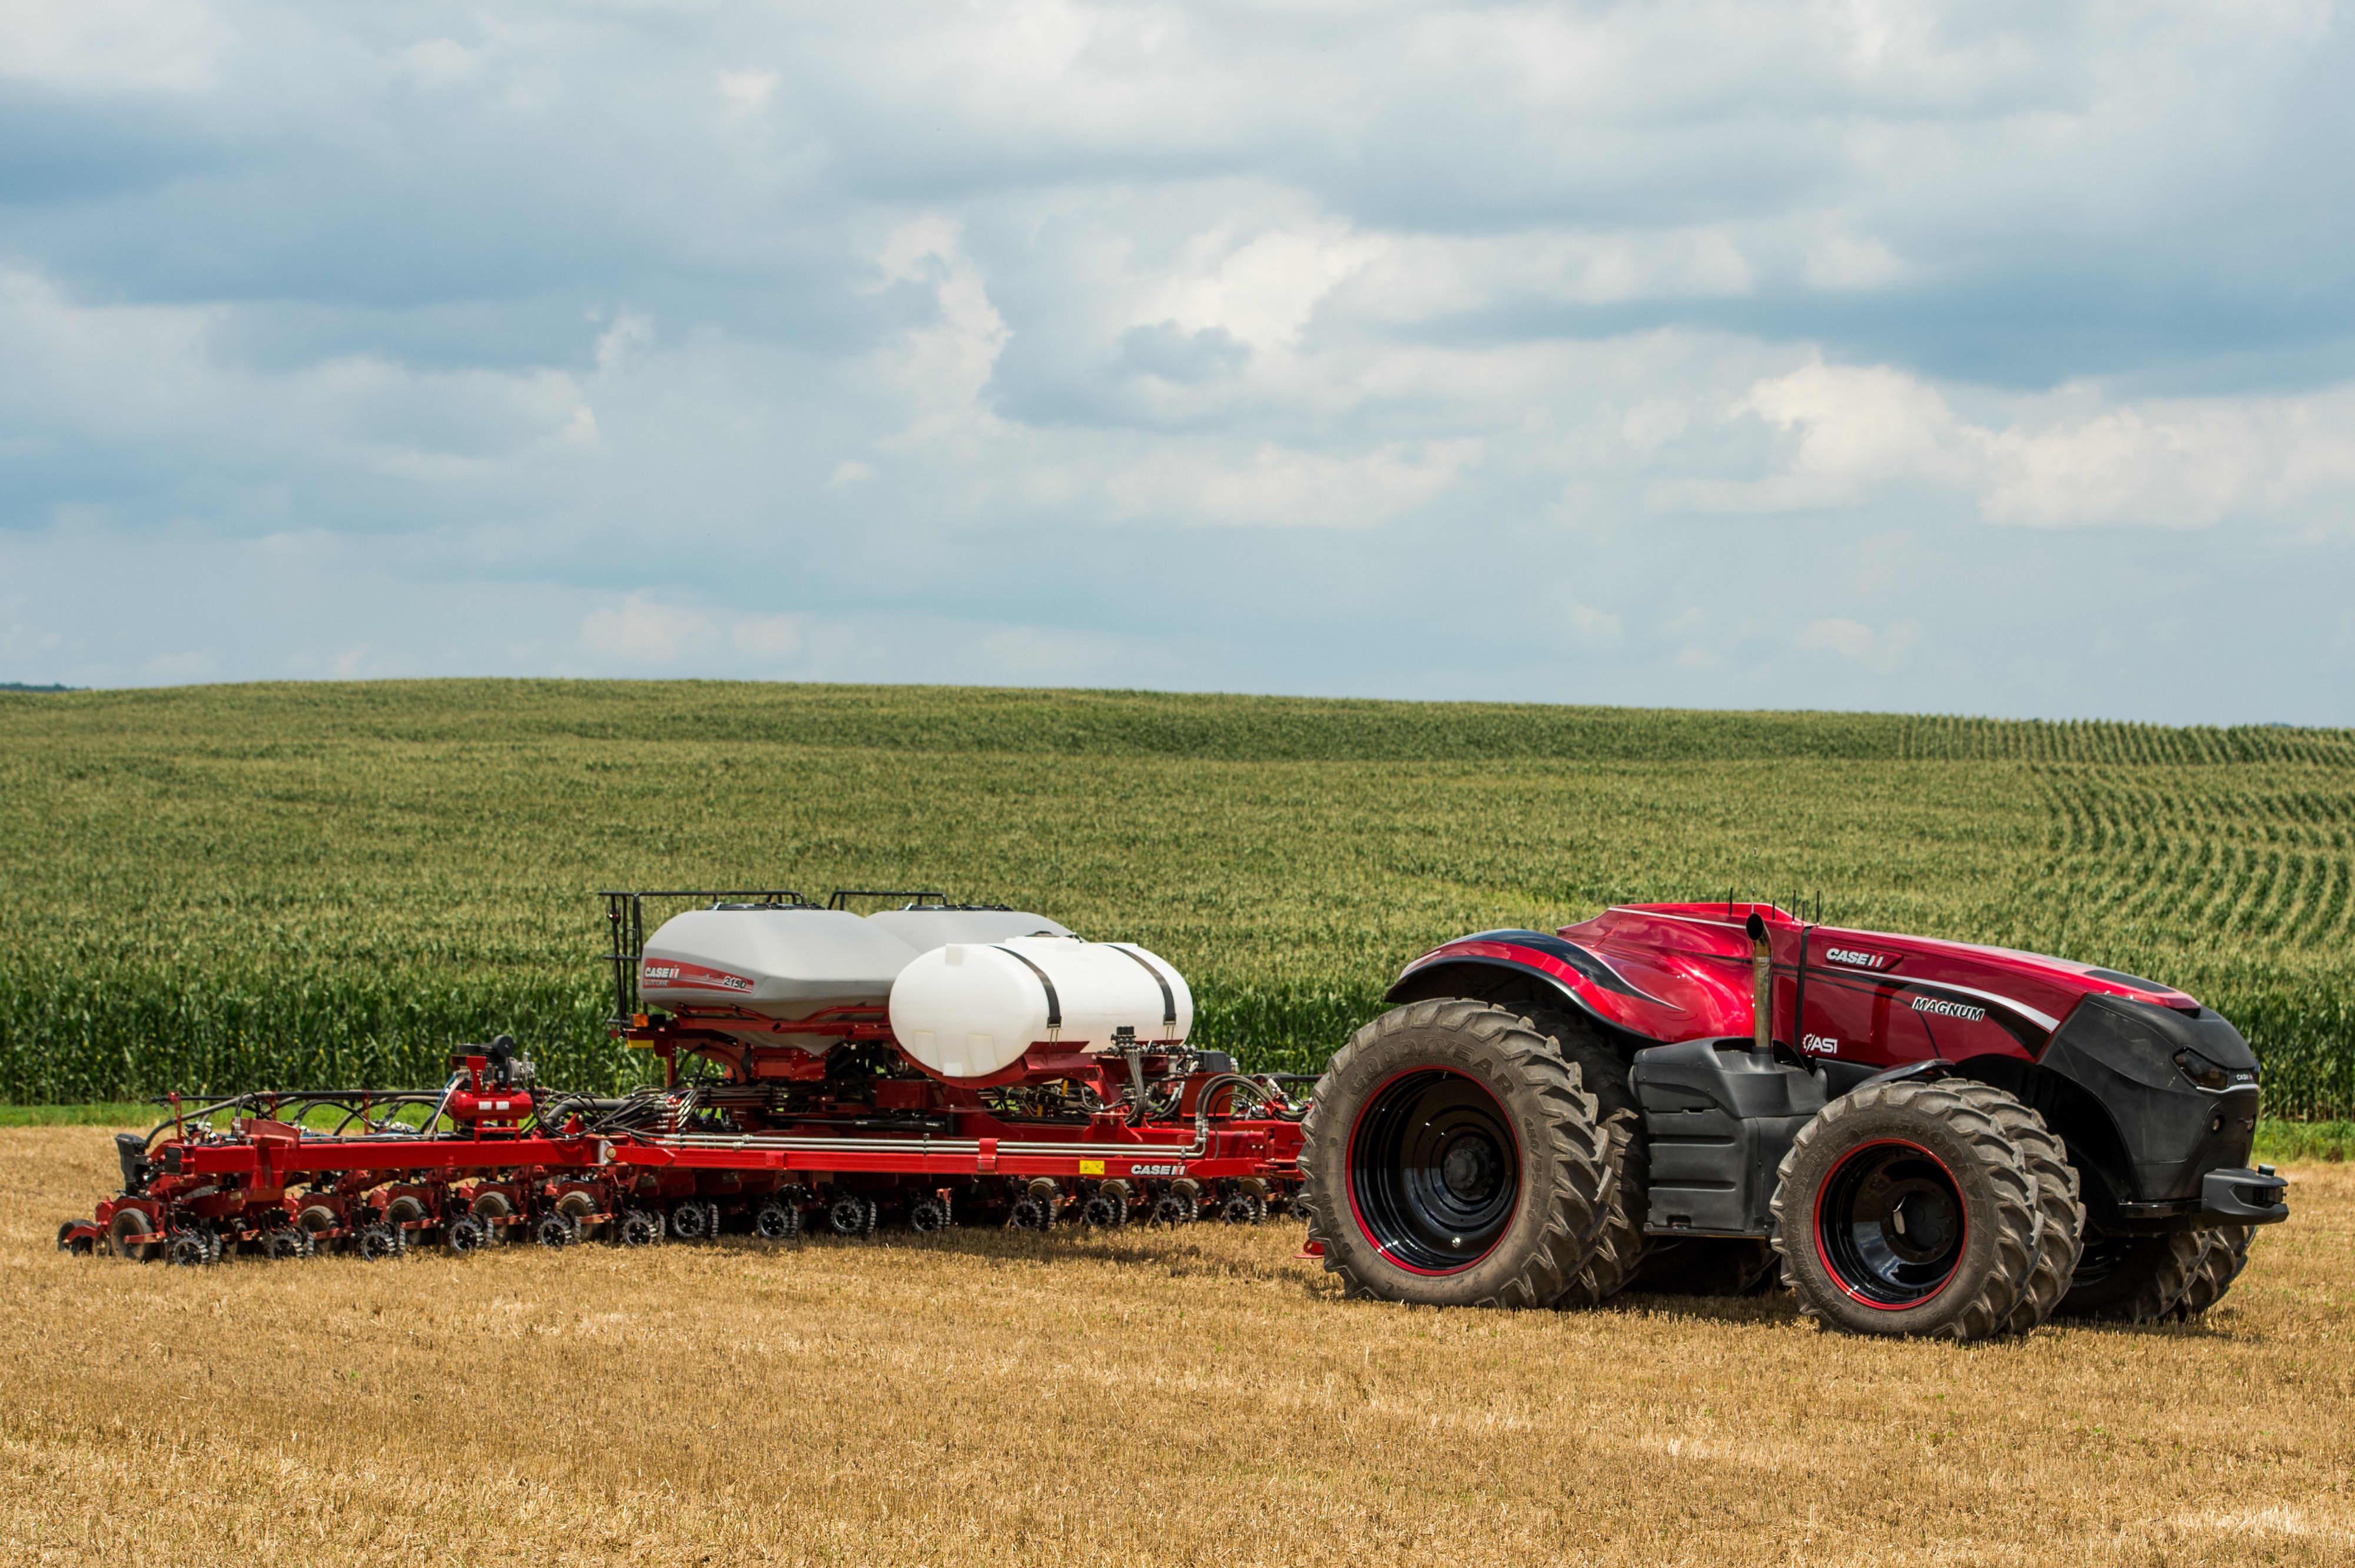 Future of farming: Driverless tractors, ag robots